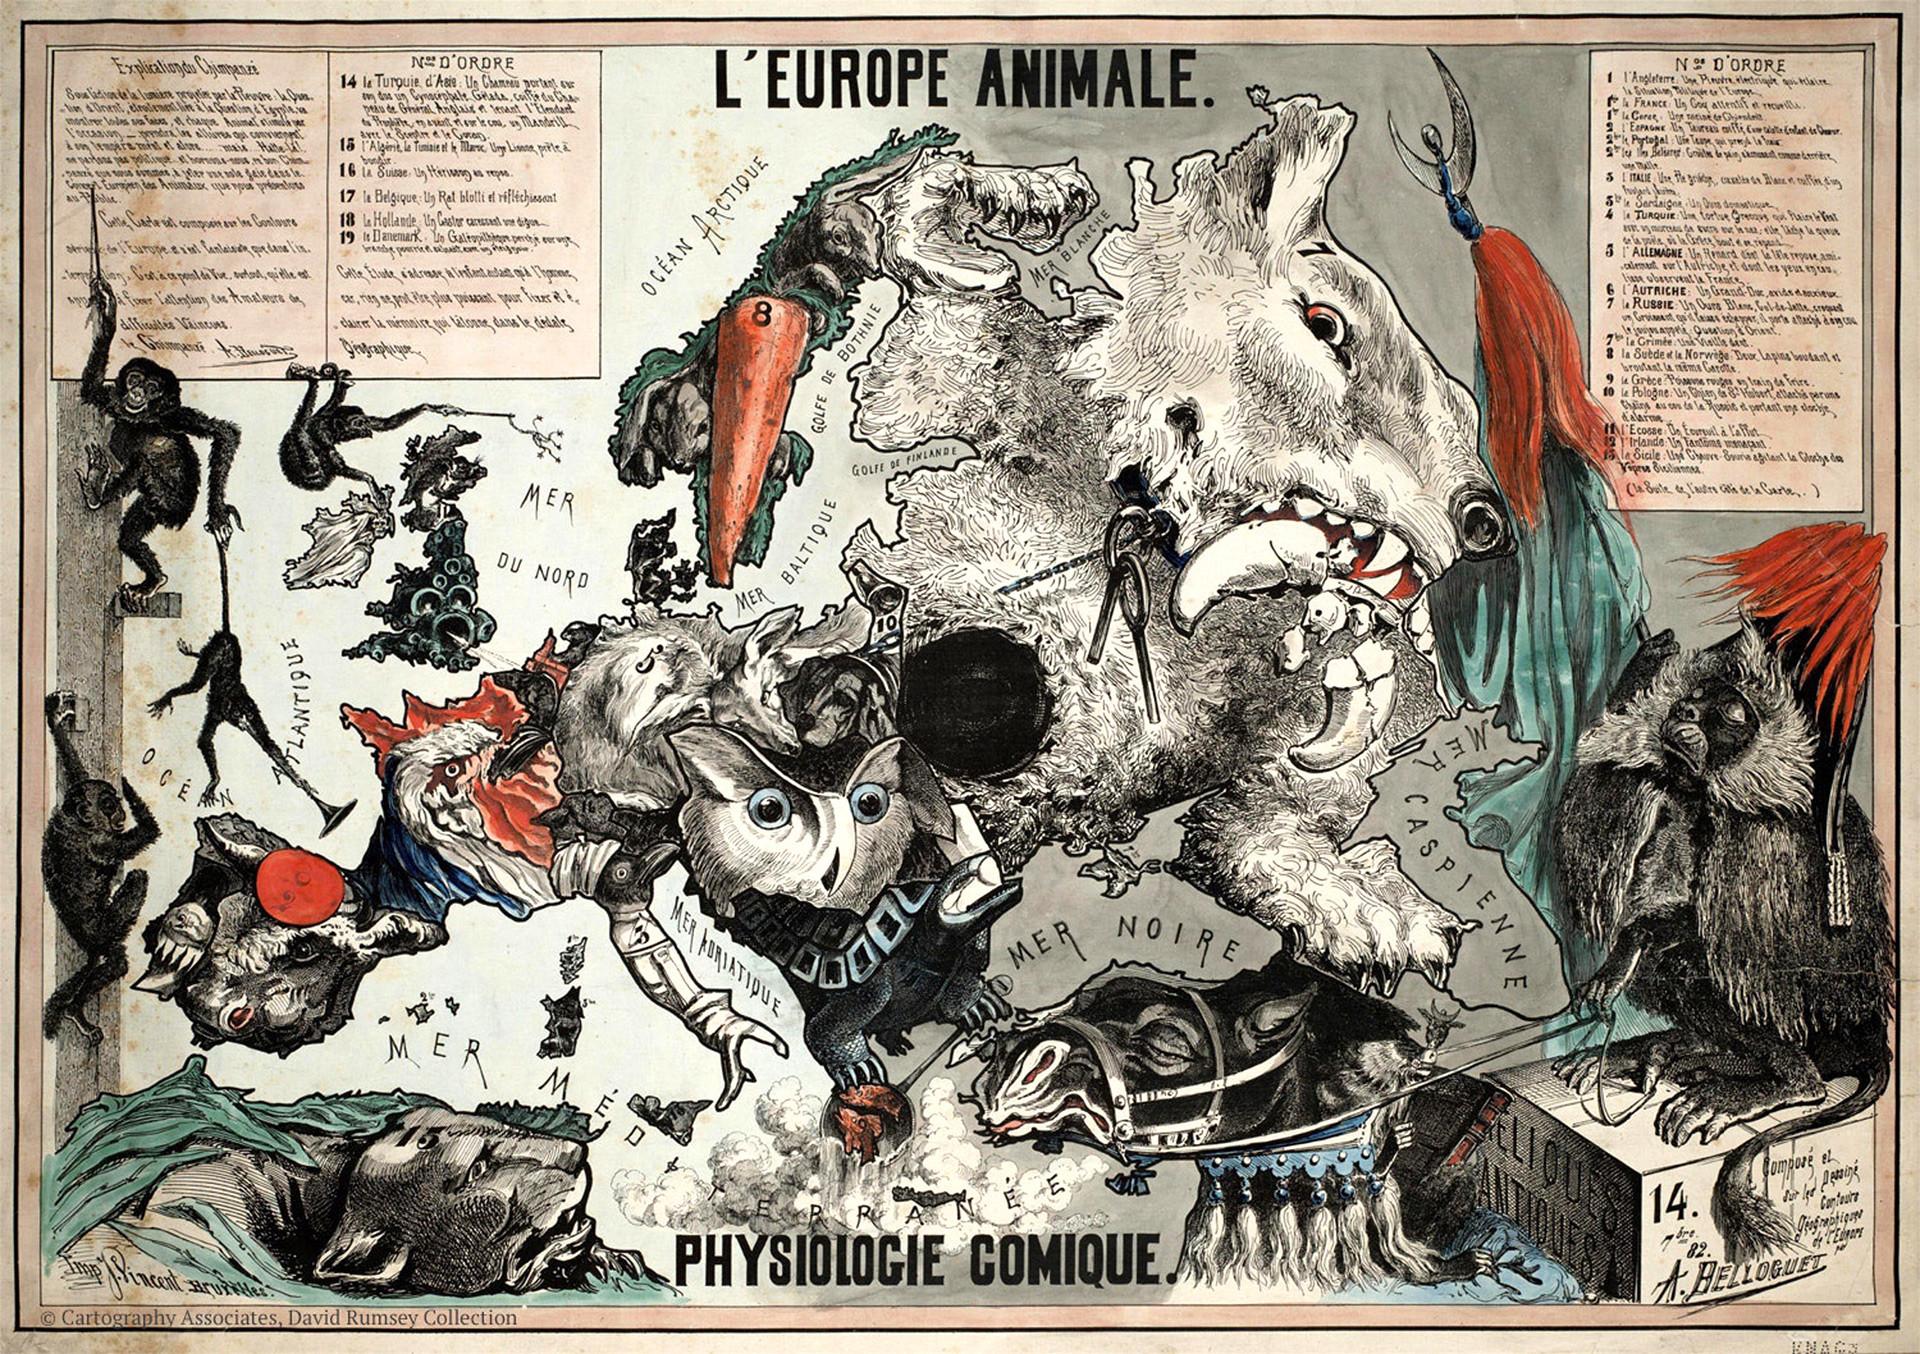 Otra de las sátiras de Andre Belloguet, realizada en 1882.